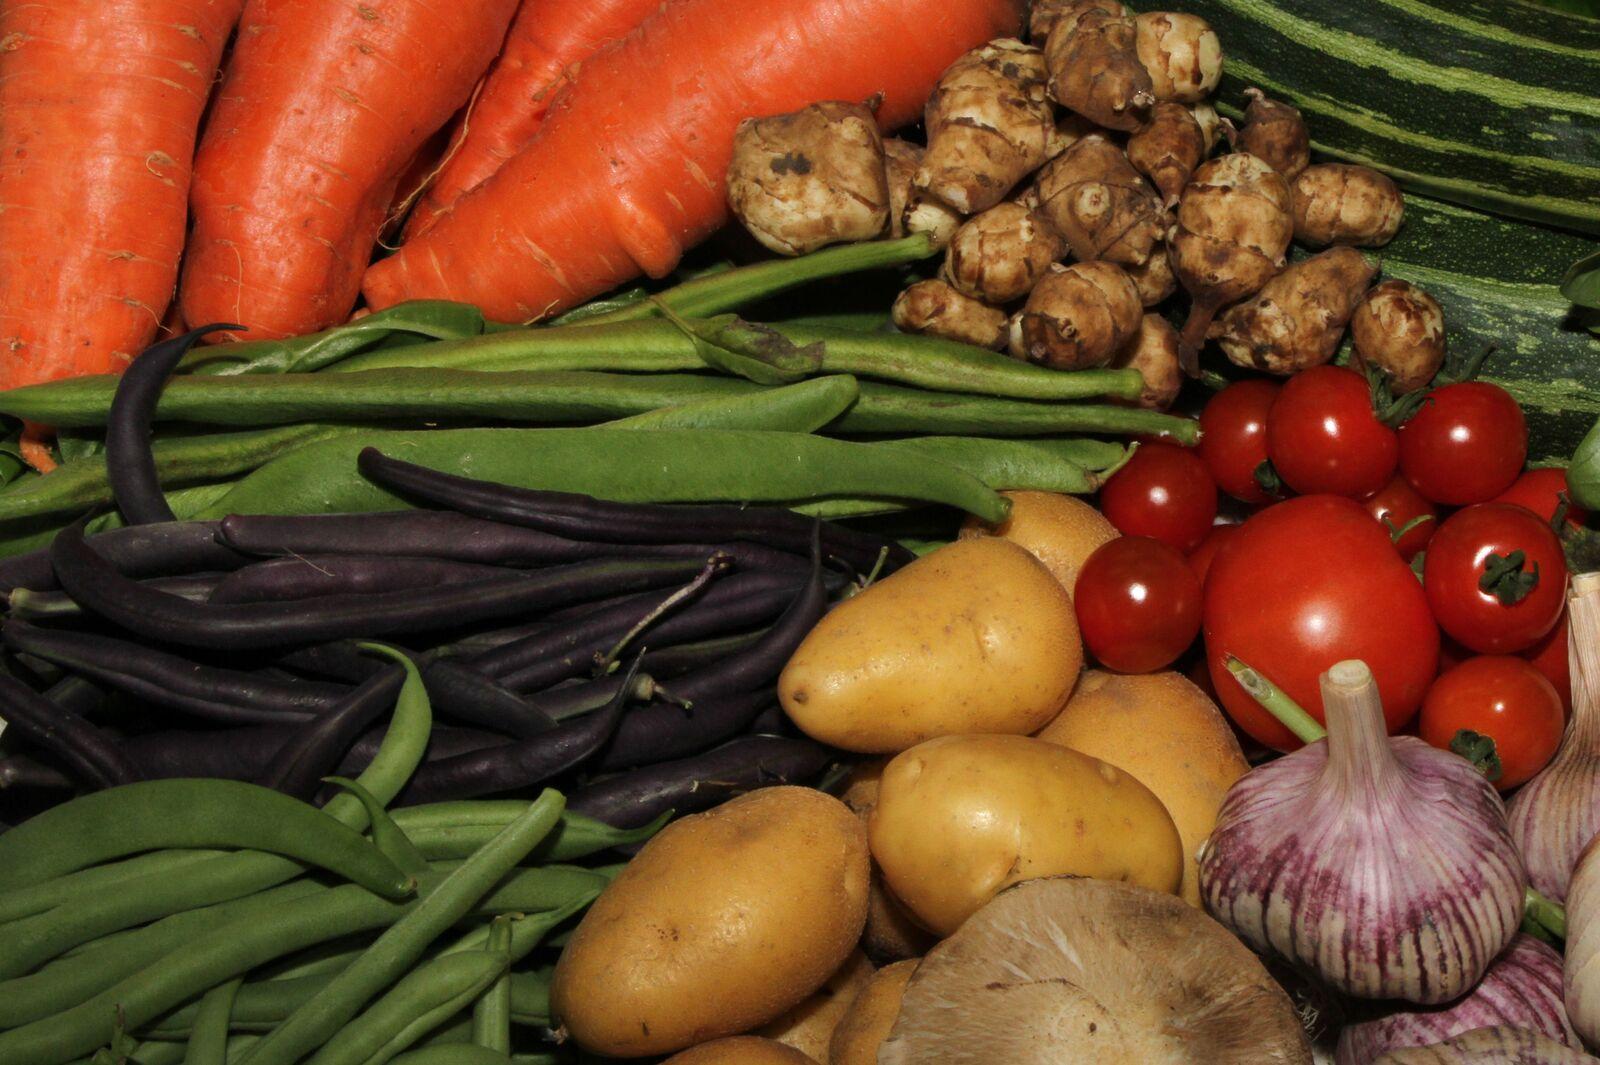 Homegrown veggies.